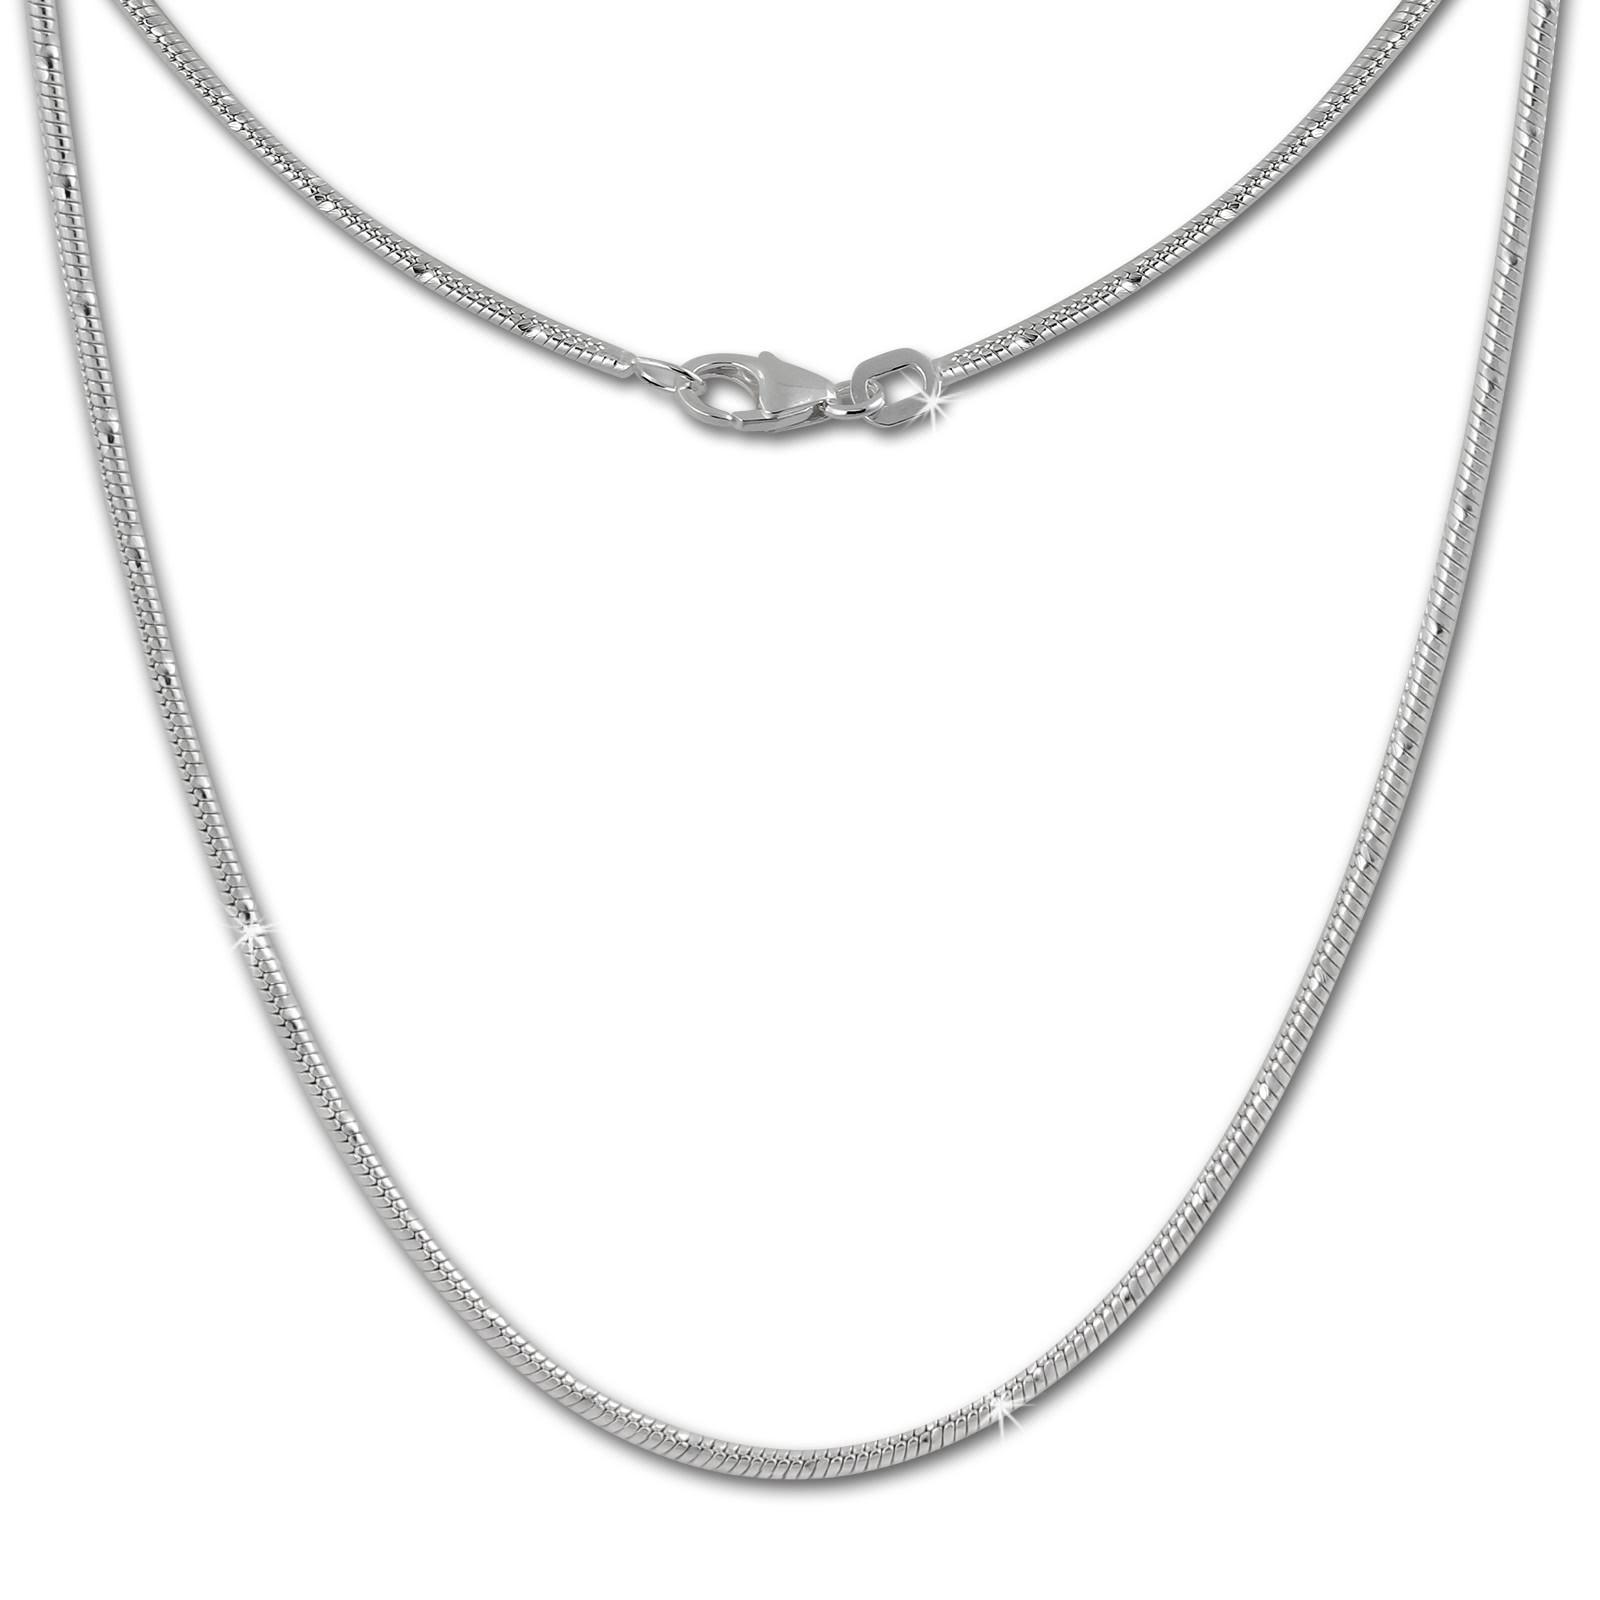 SilberDream Schlangenkette 925er Silber Halskette 70cm Kette SDK21070